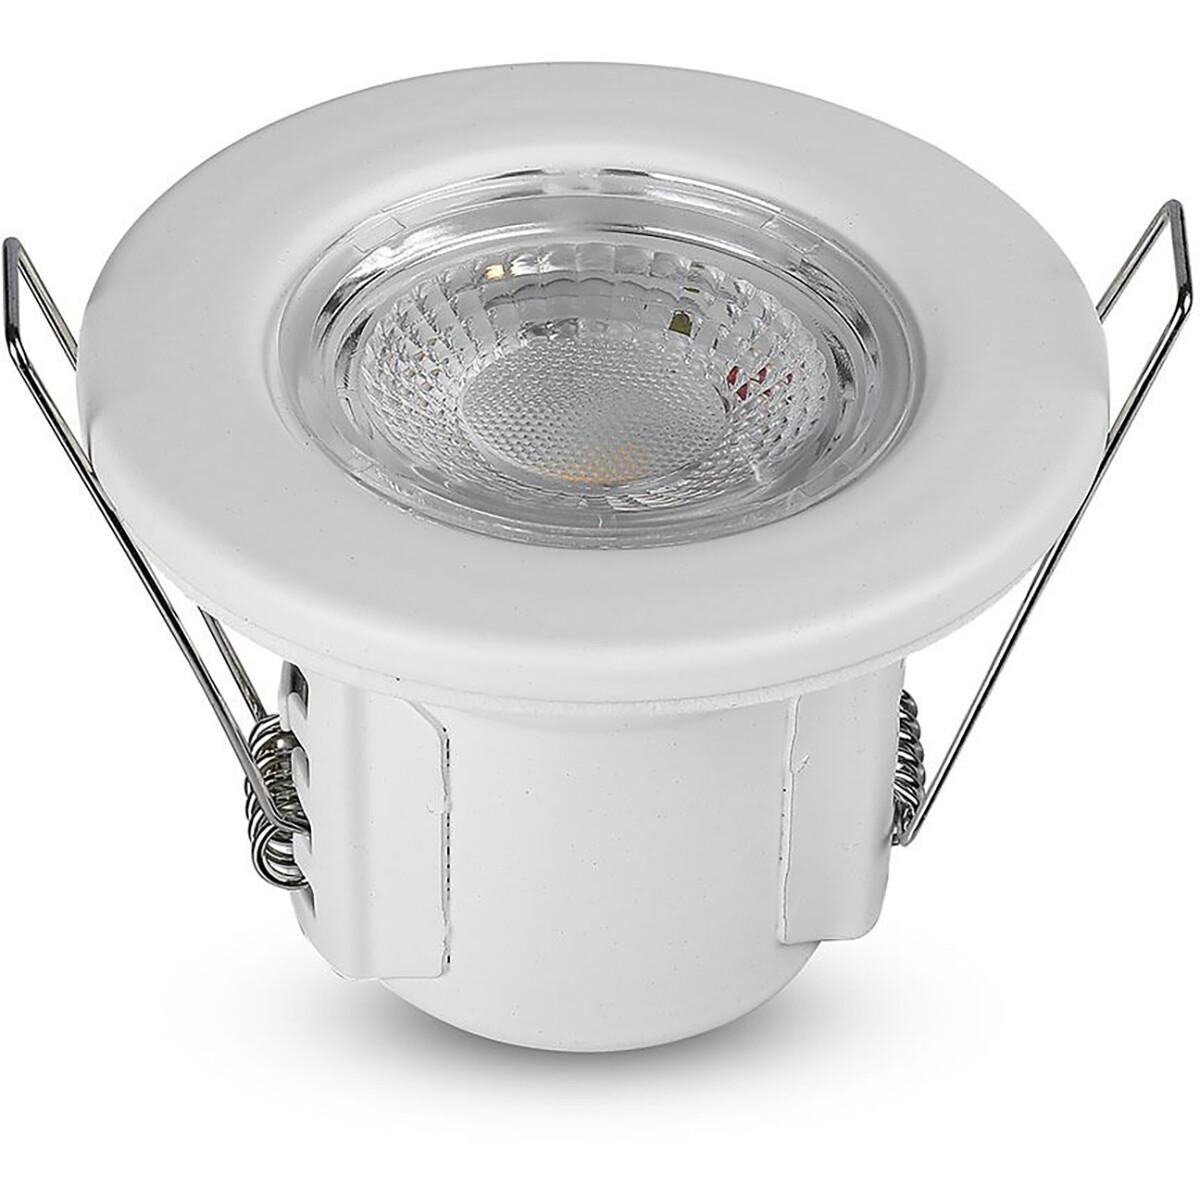 SAMSUNG - LED Spot - Inbouwspot - Viron Cunvi - 5W - Waterdicht IP65 - Dimbaar - Warm Wit 3000K - Ma